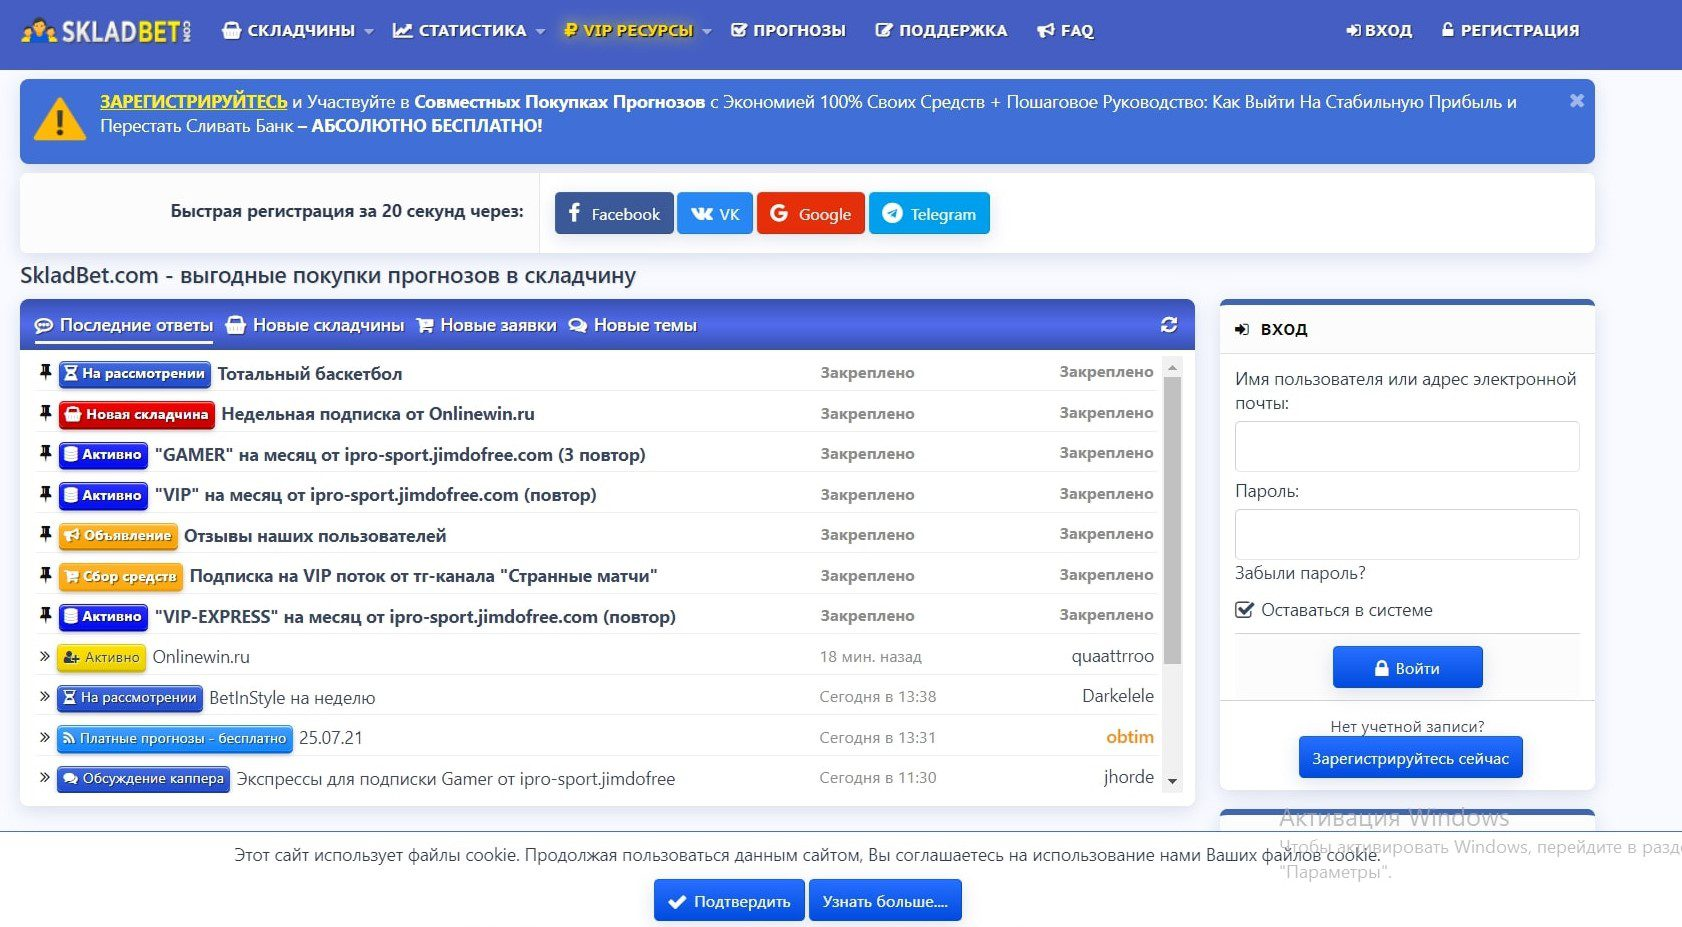 Проект Skladbet - складчина покупки прогнозов